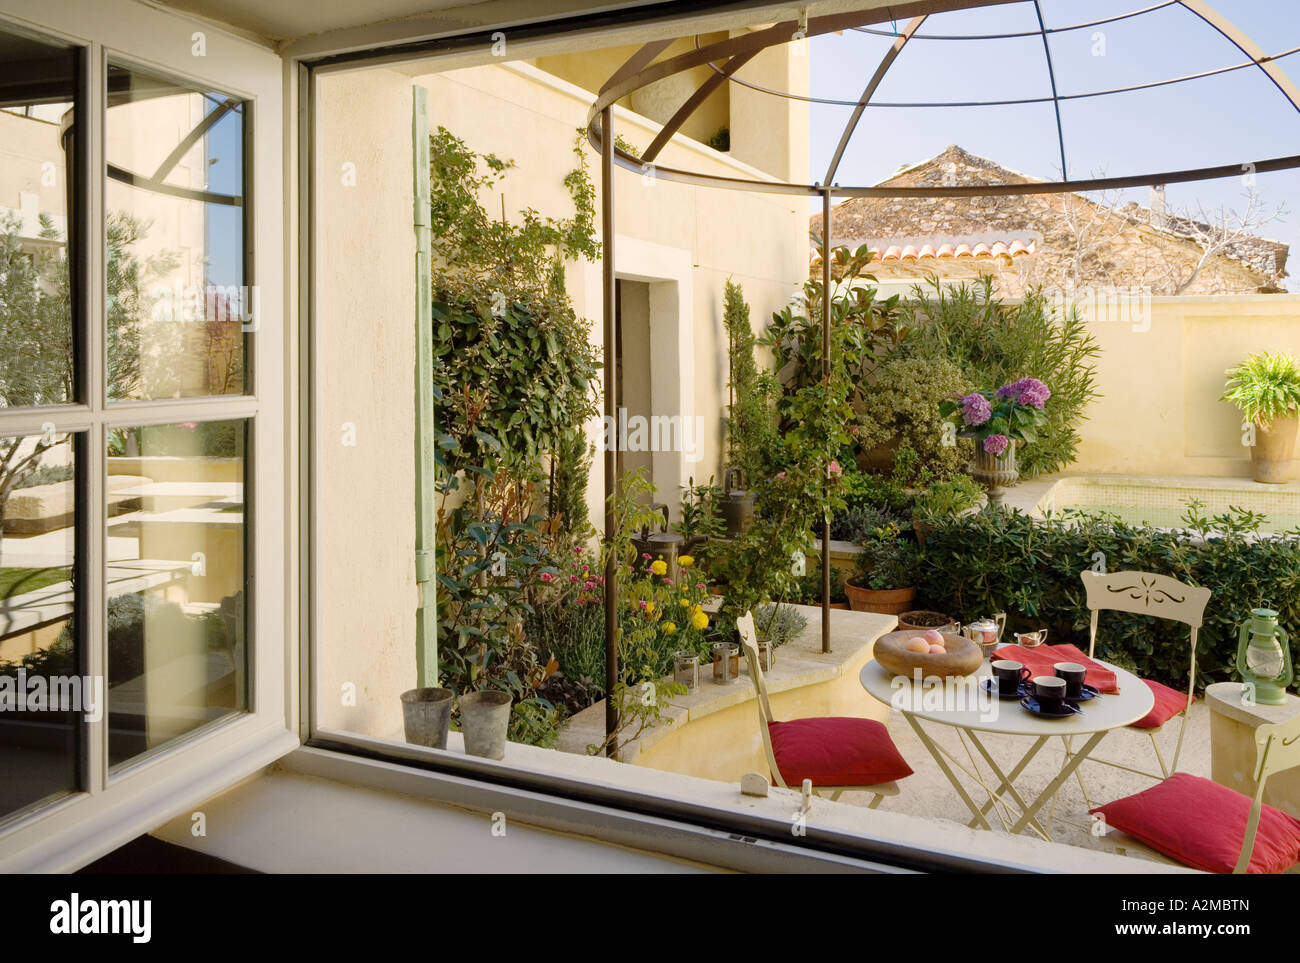 Roof garden/ courtyard of traditional Provençal villa, France - Stock Image